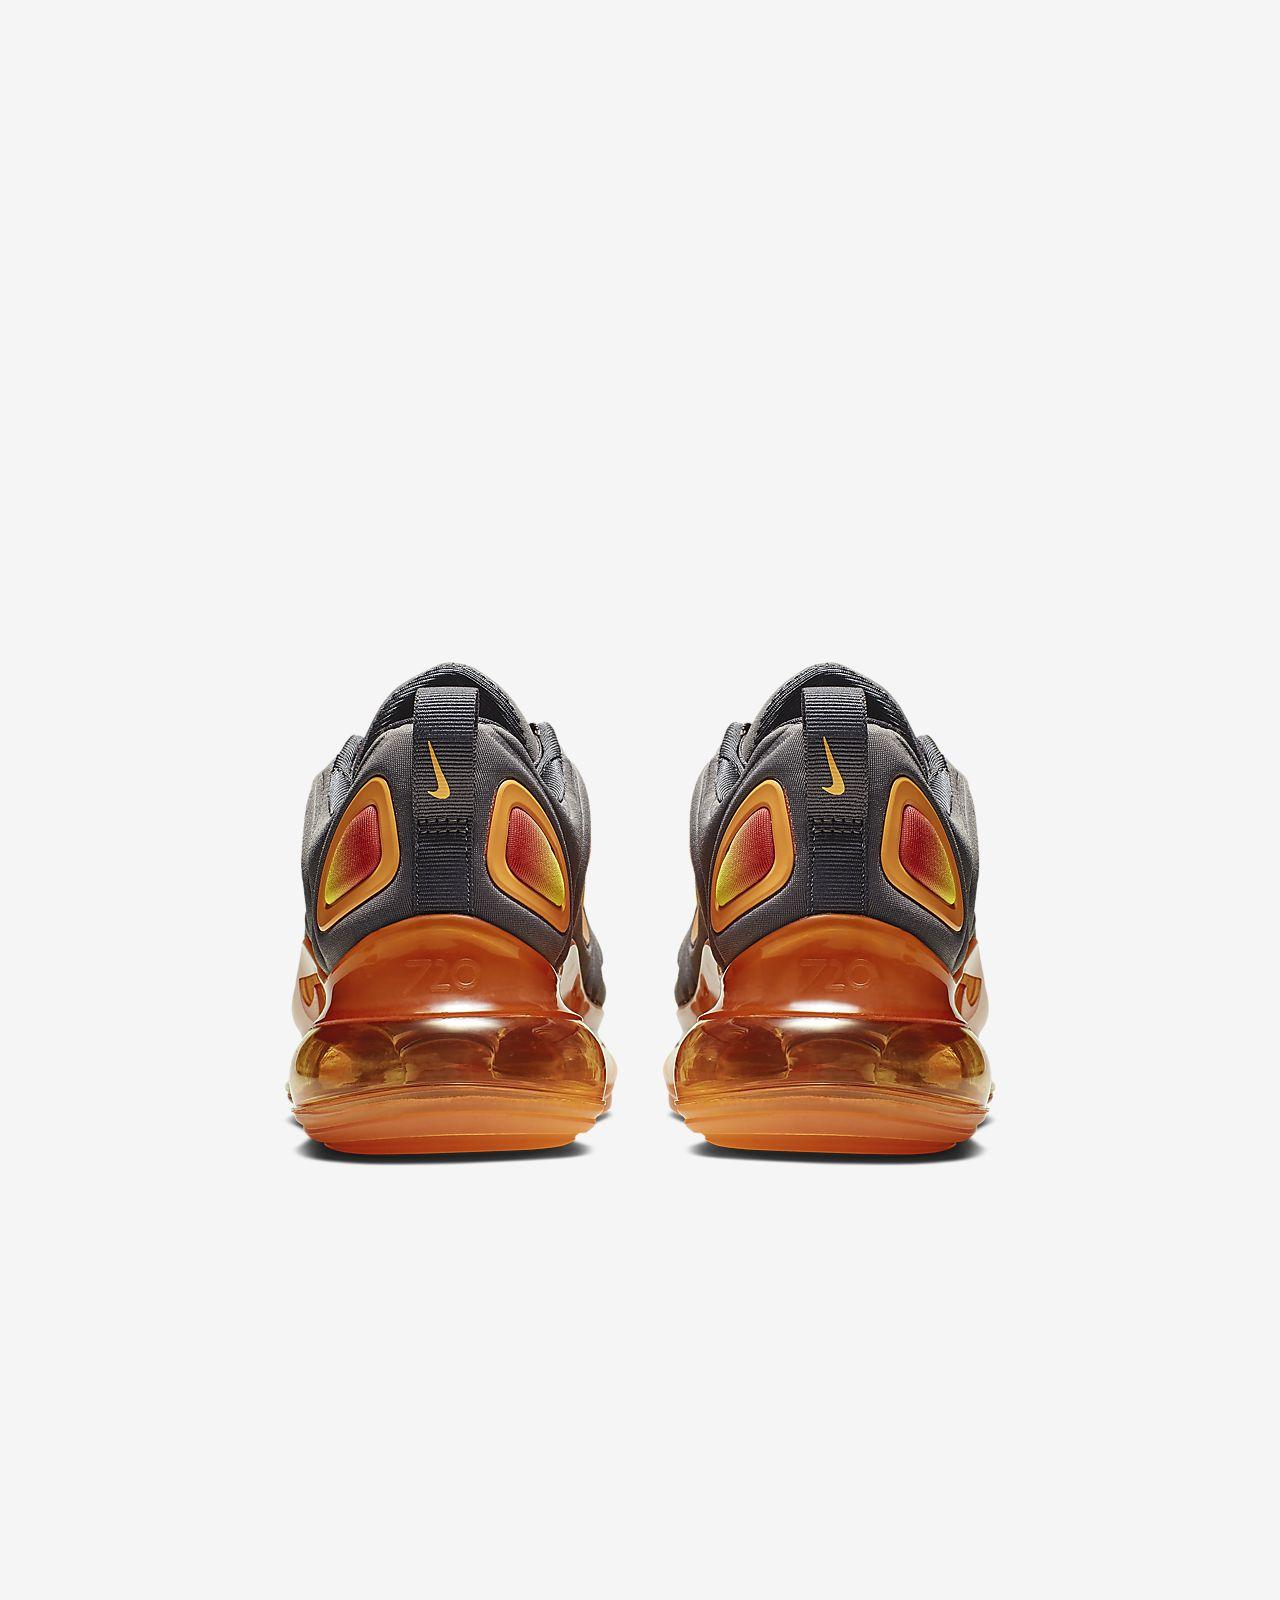 c736456c8d Nike Air Max 720 Younger/Older Kids' Shoe. Nike.com DK